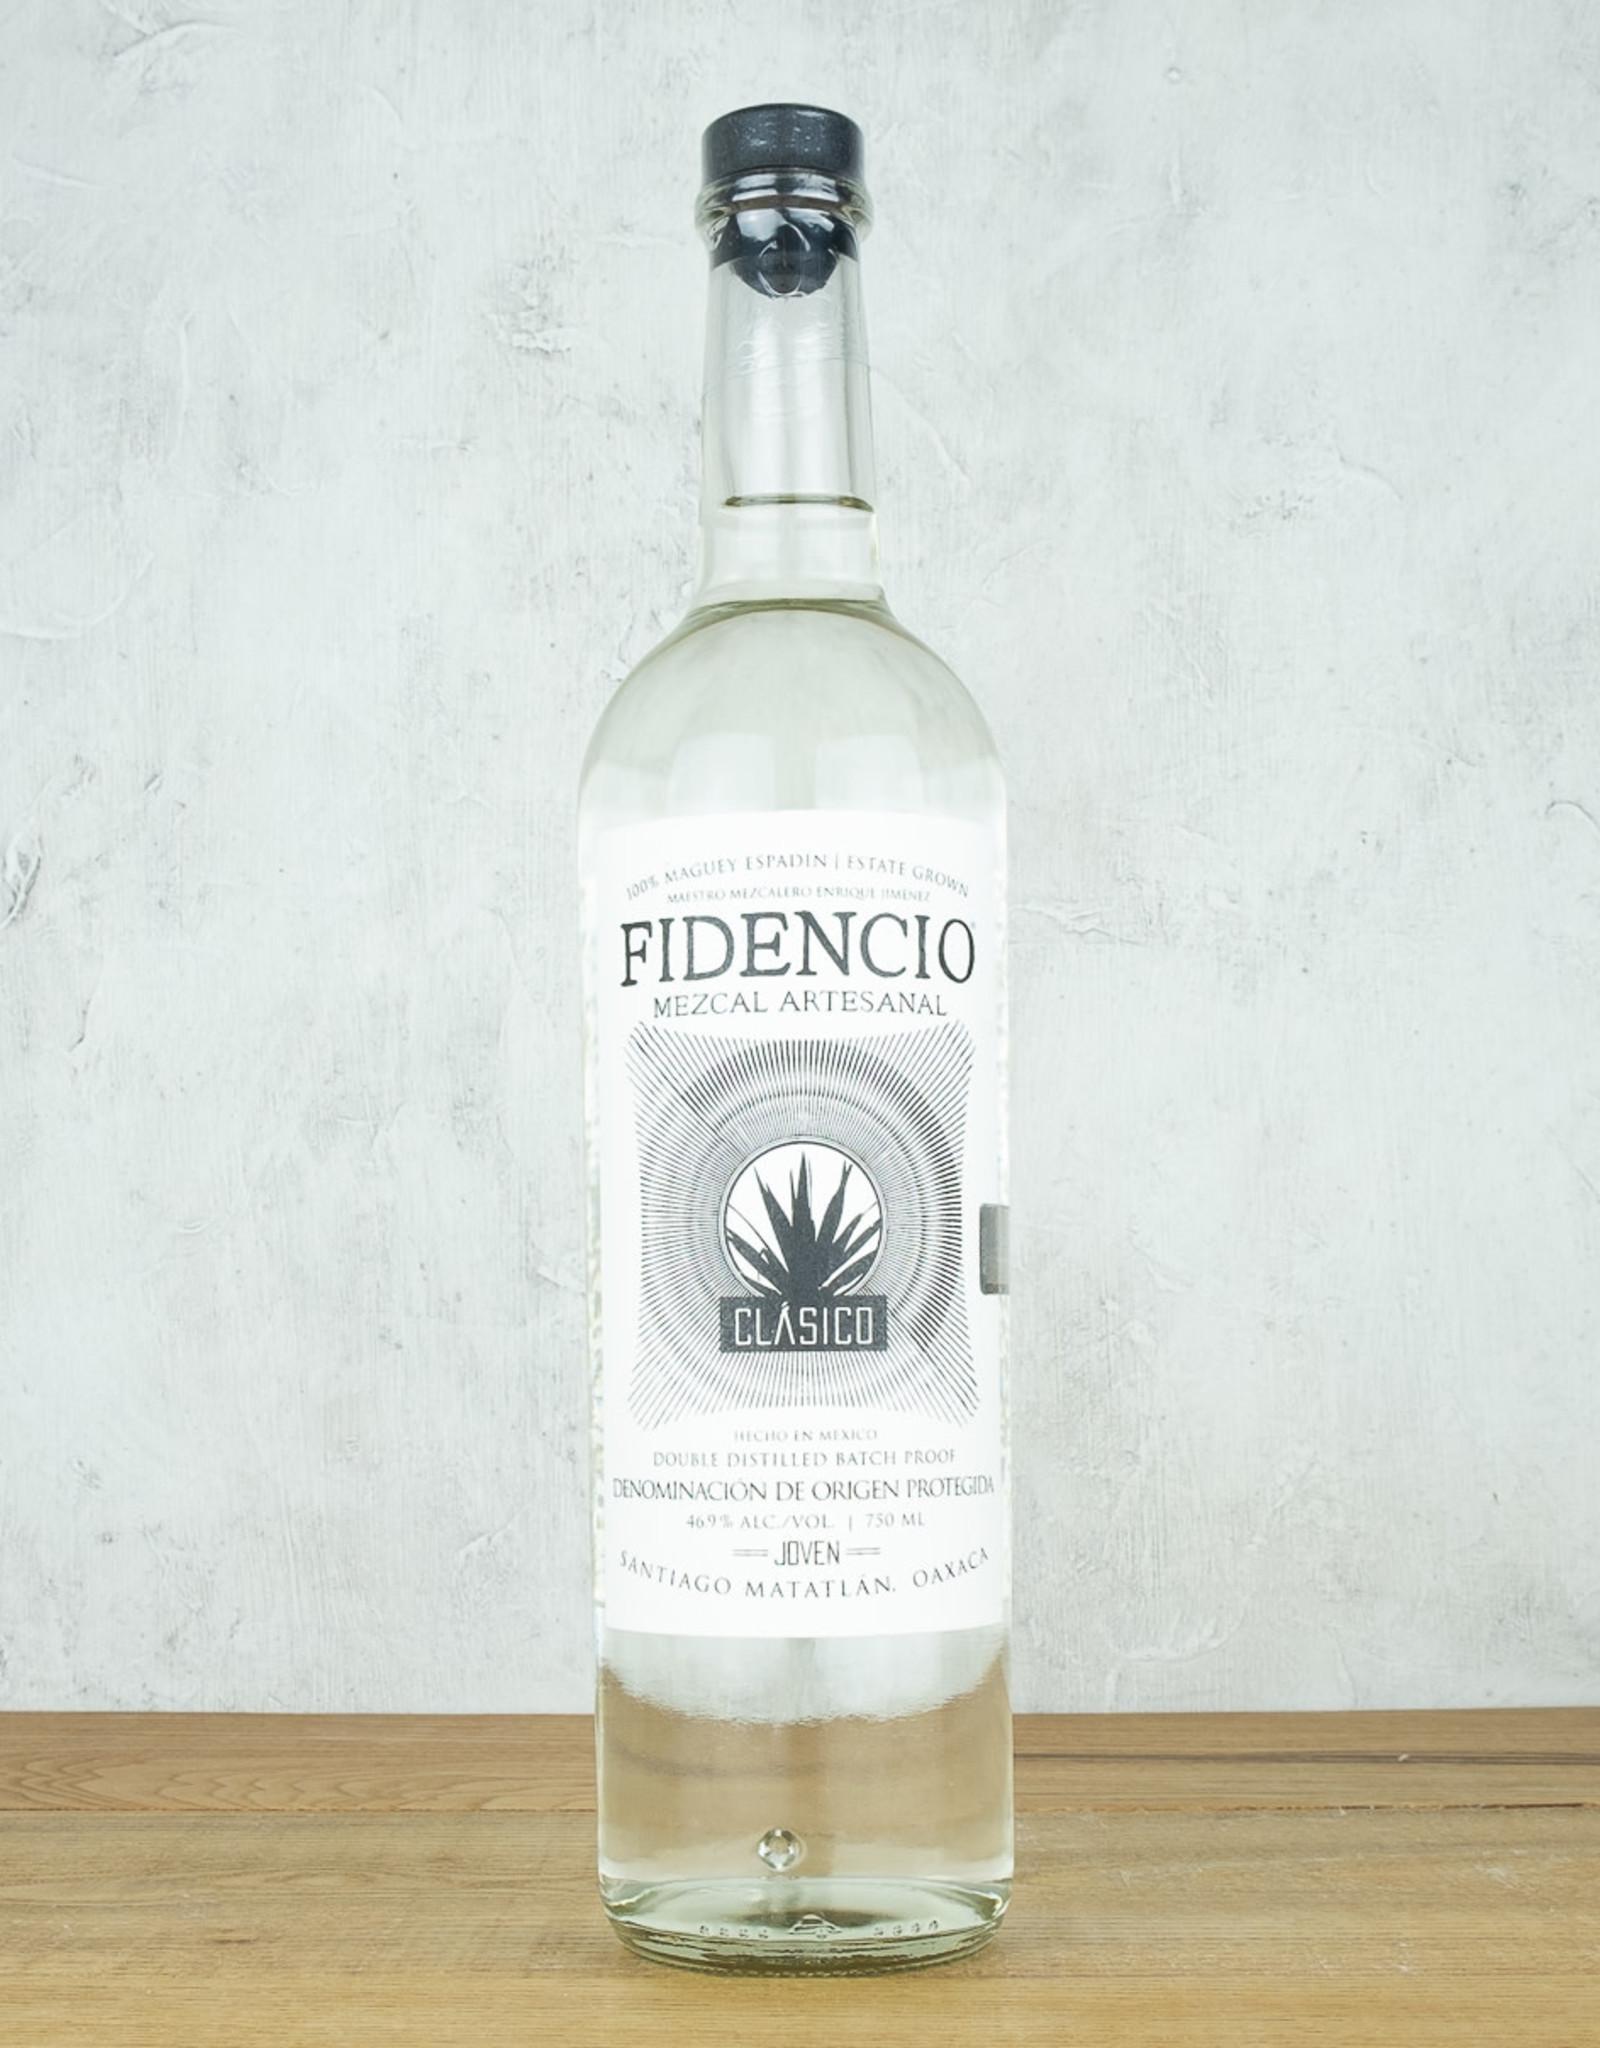 Fidencio Mezcal Classico